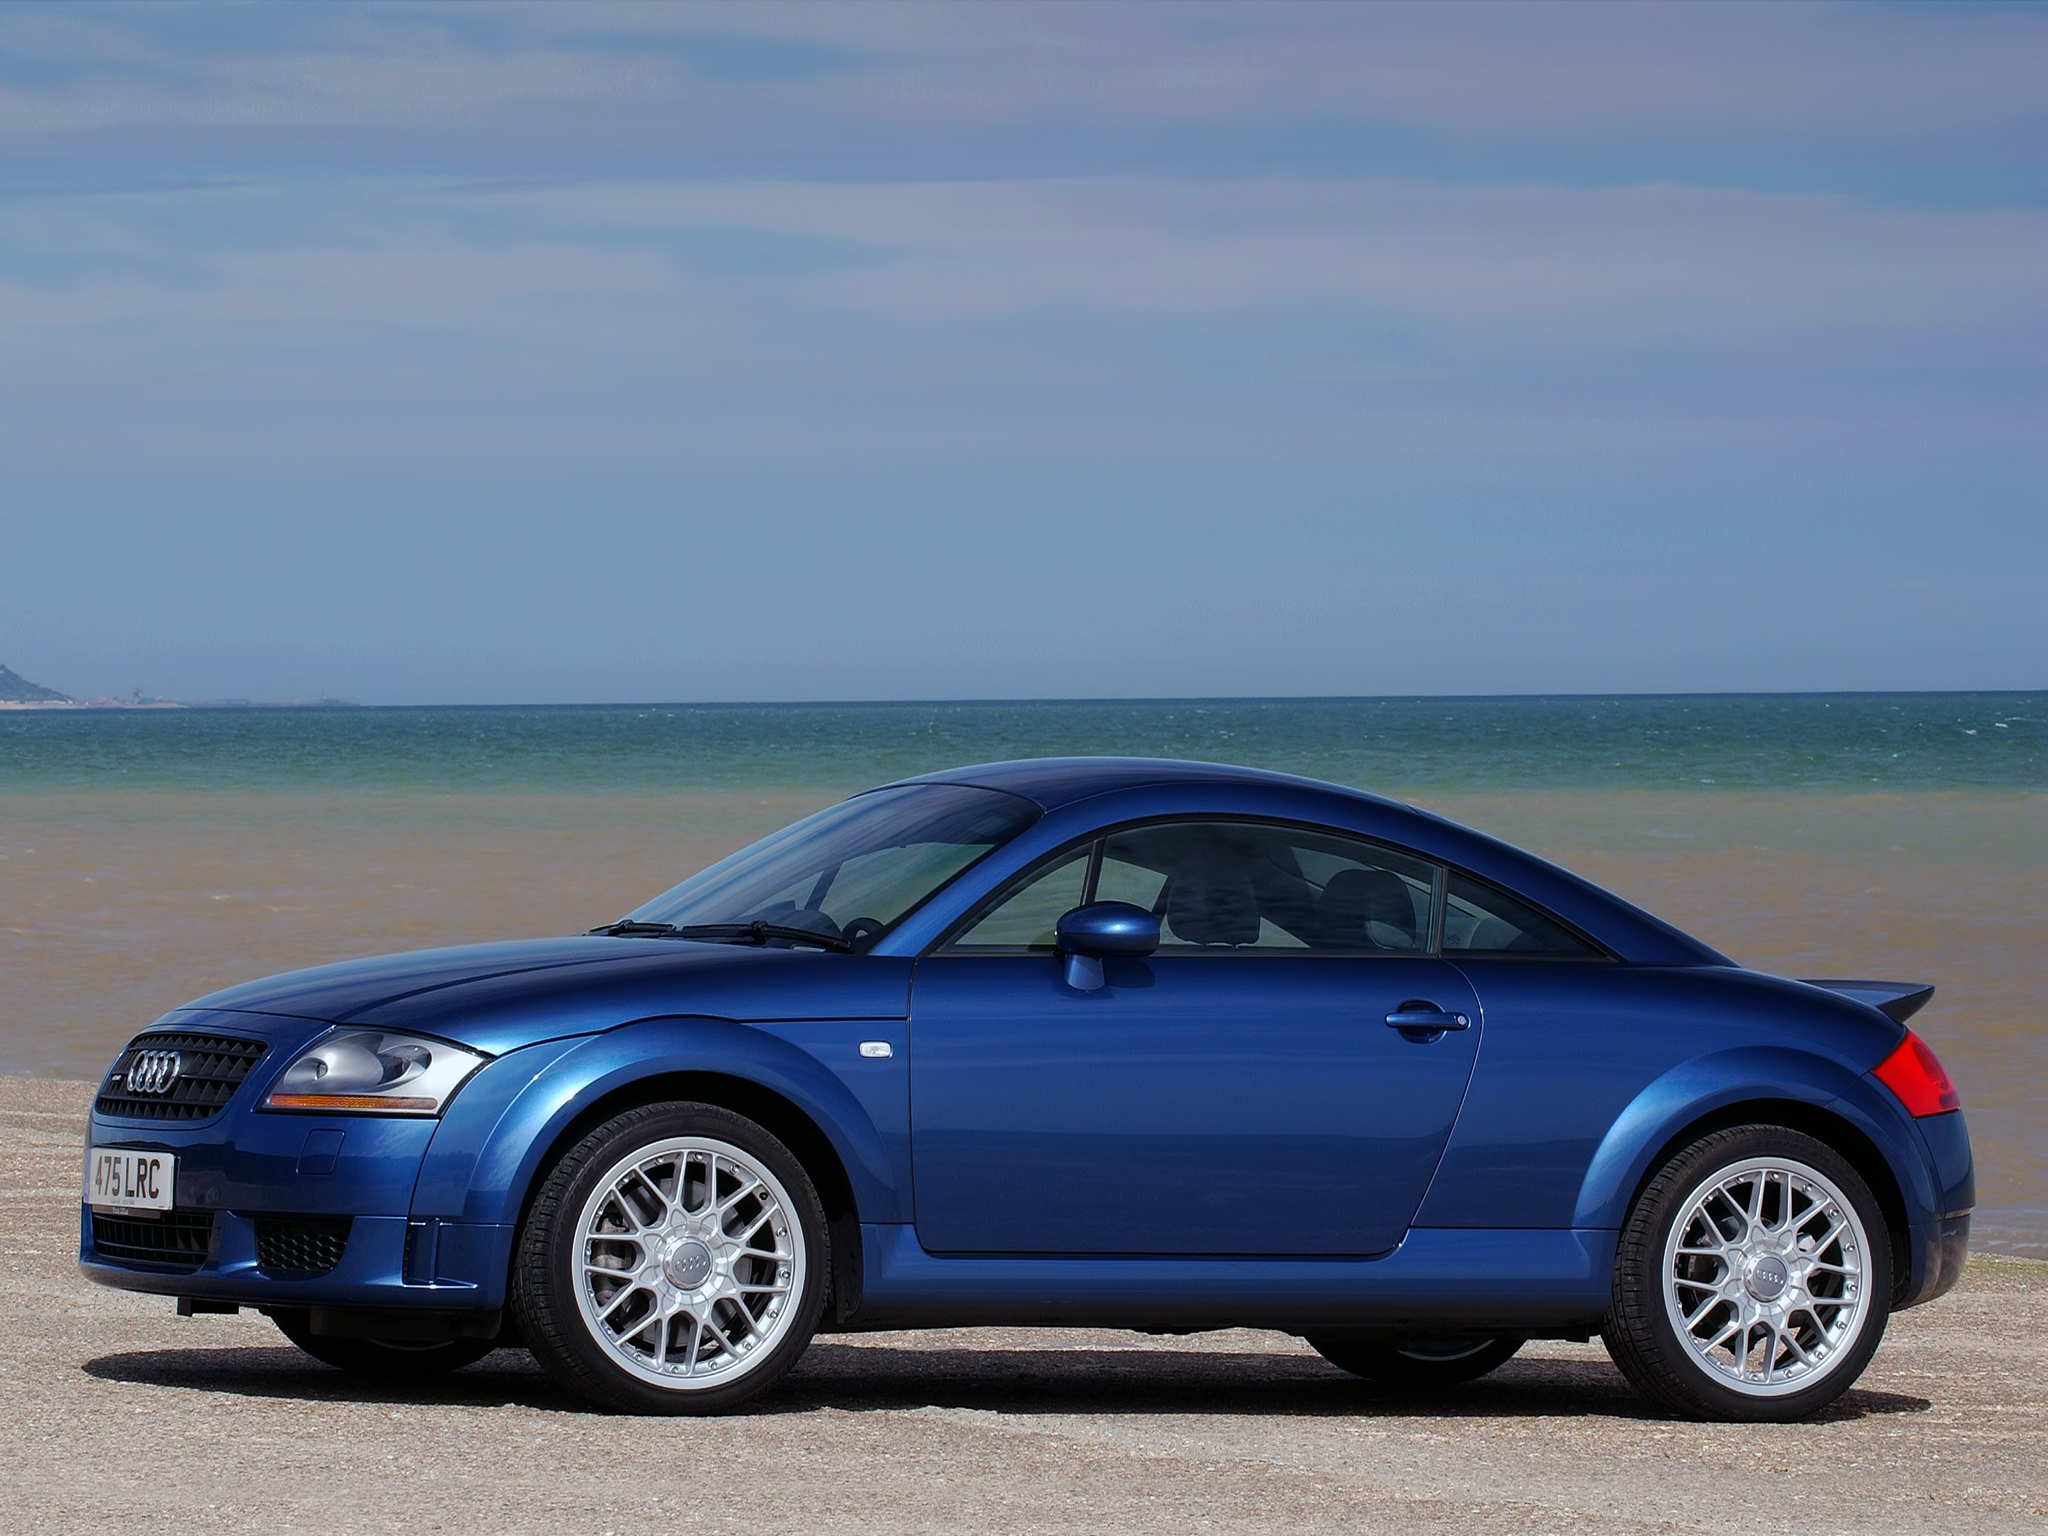 Audi Tt Picture 98897 Audi Photo Gallery Carsbasecom